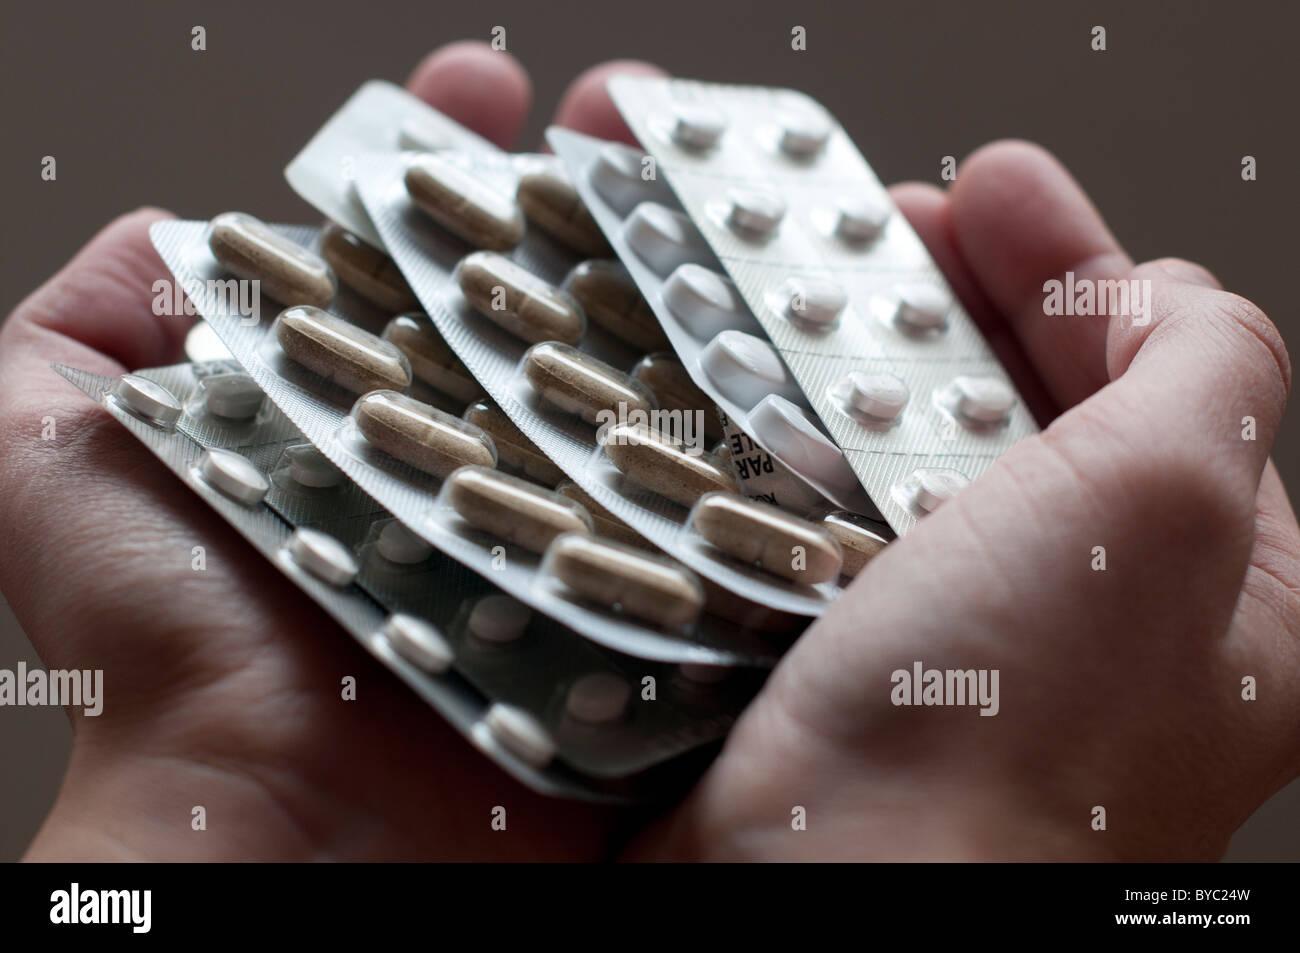 hands holding prescription  pills - Stock Image